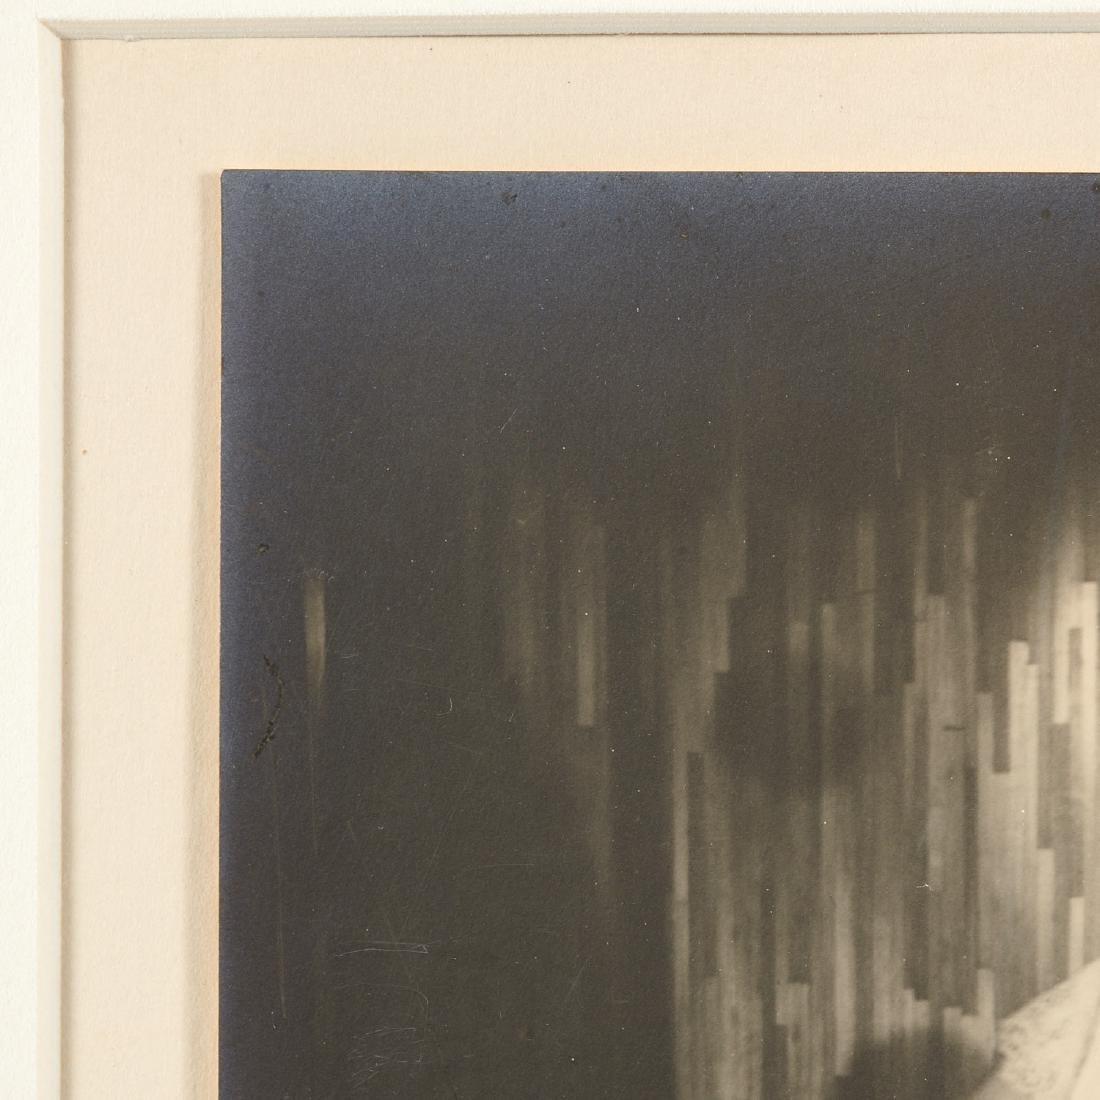 Man Ray, Society Photograph, c. 1930 - 2